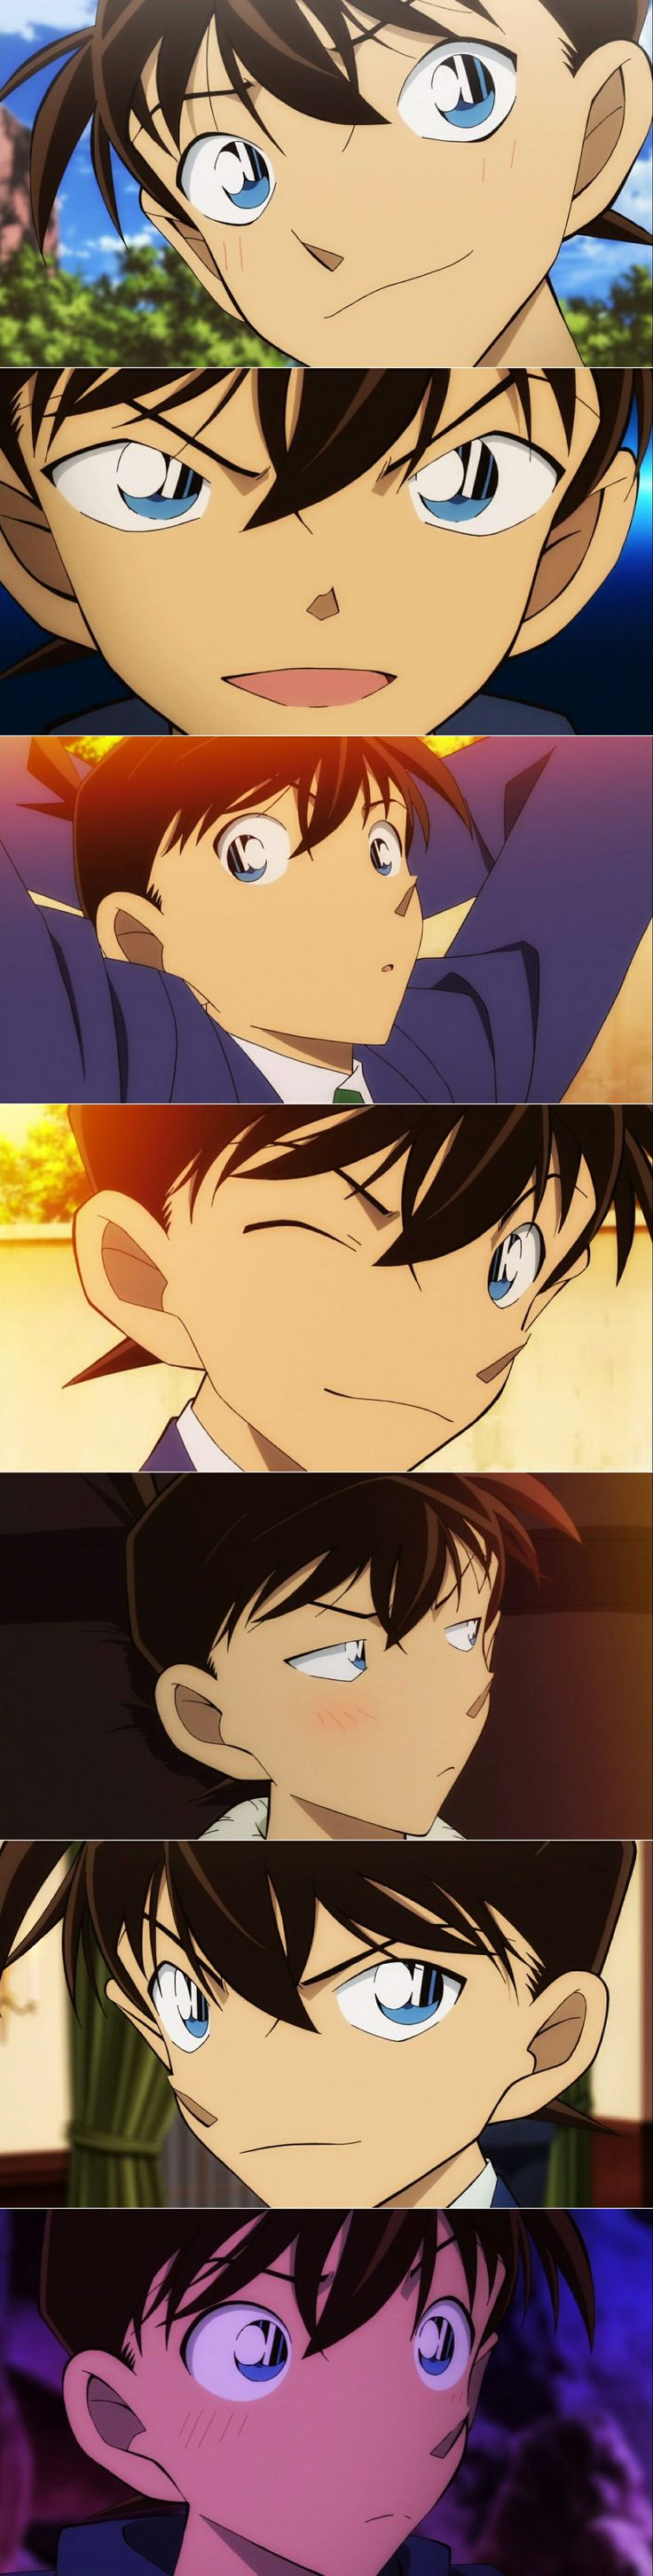 ♥@CharmingMystery♥: Best of Shinichi ;)